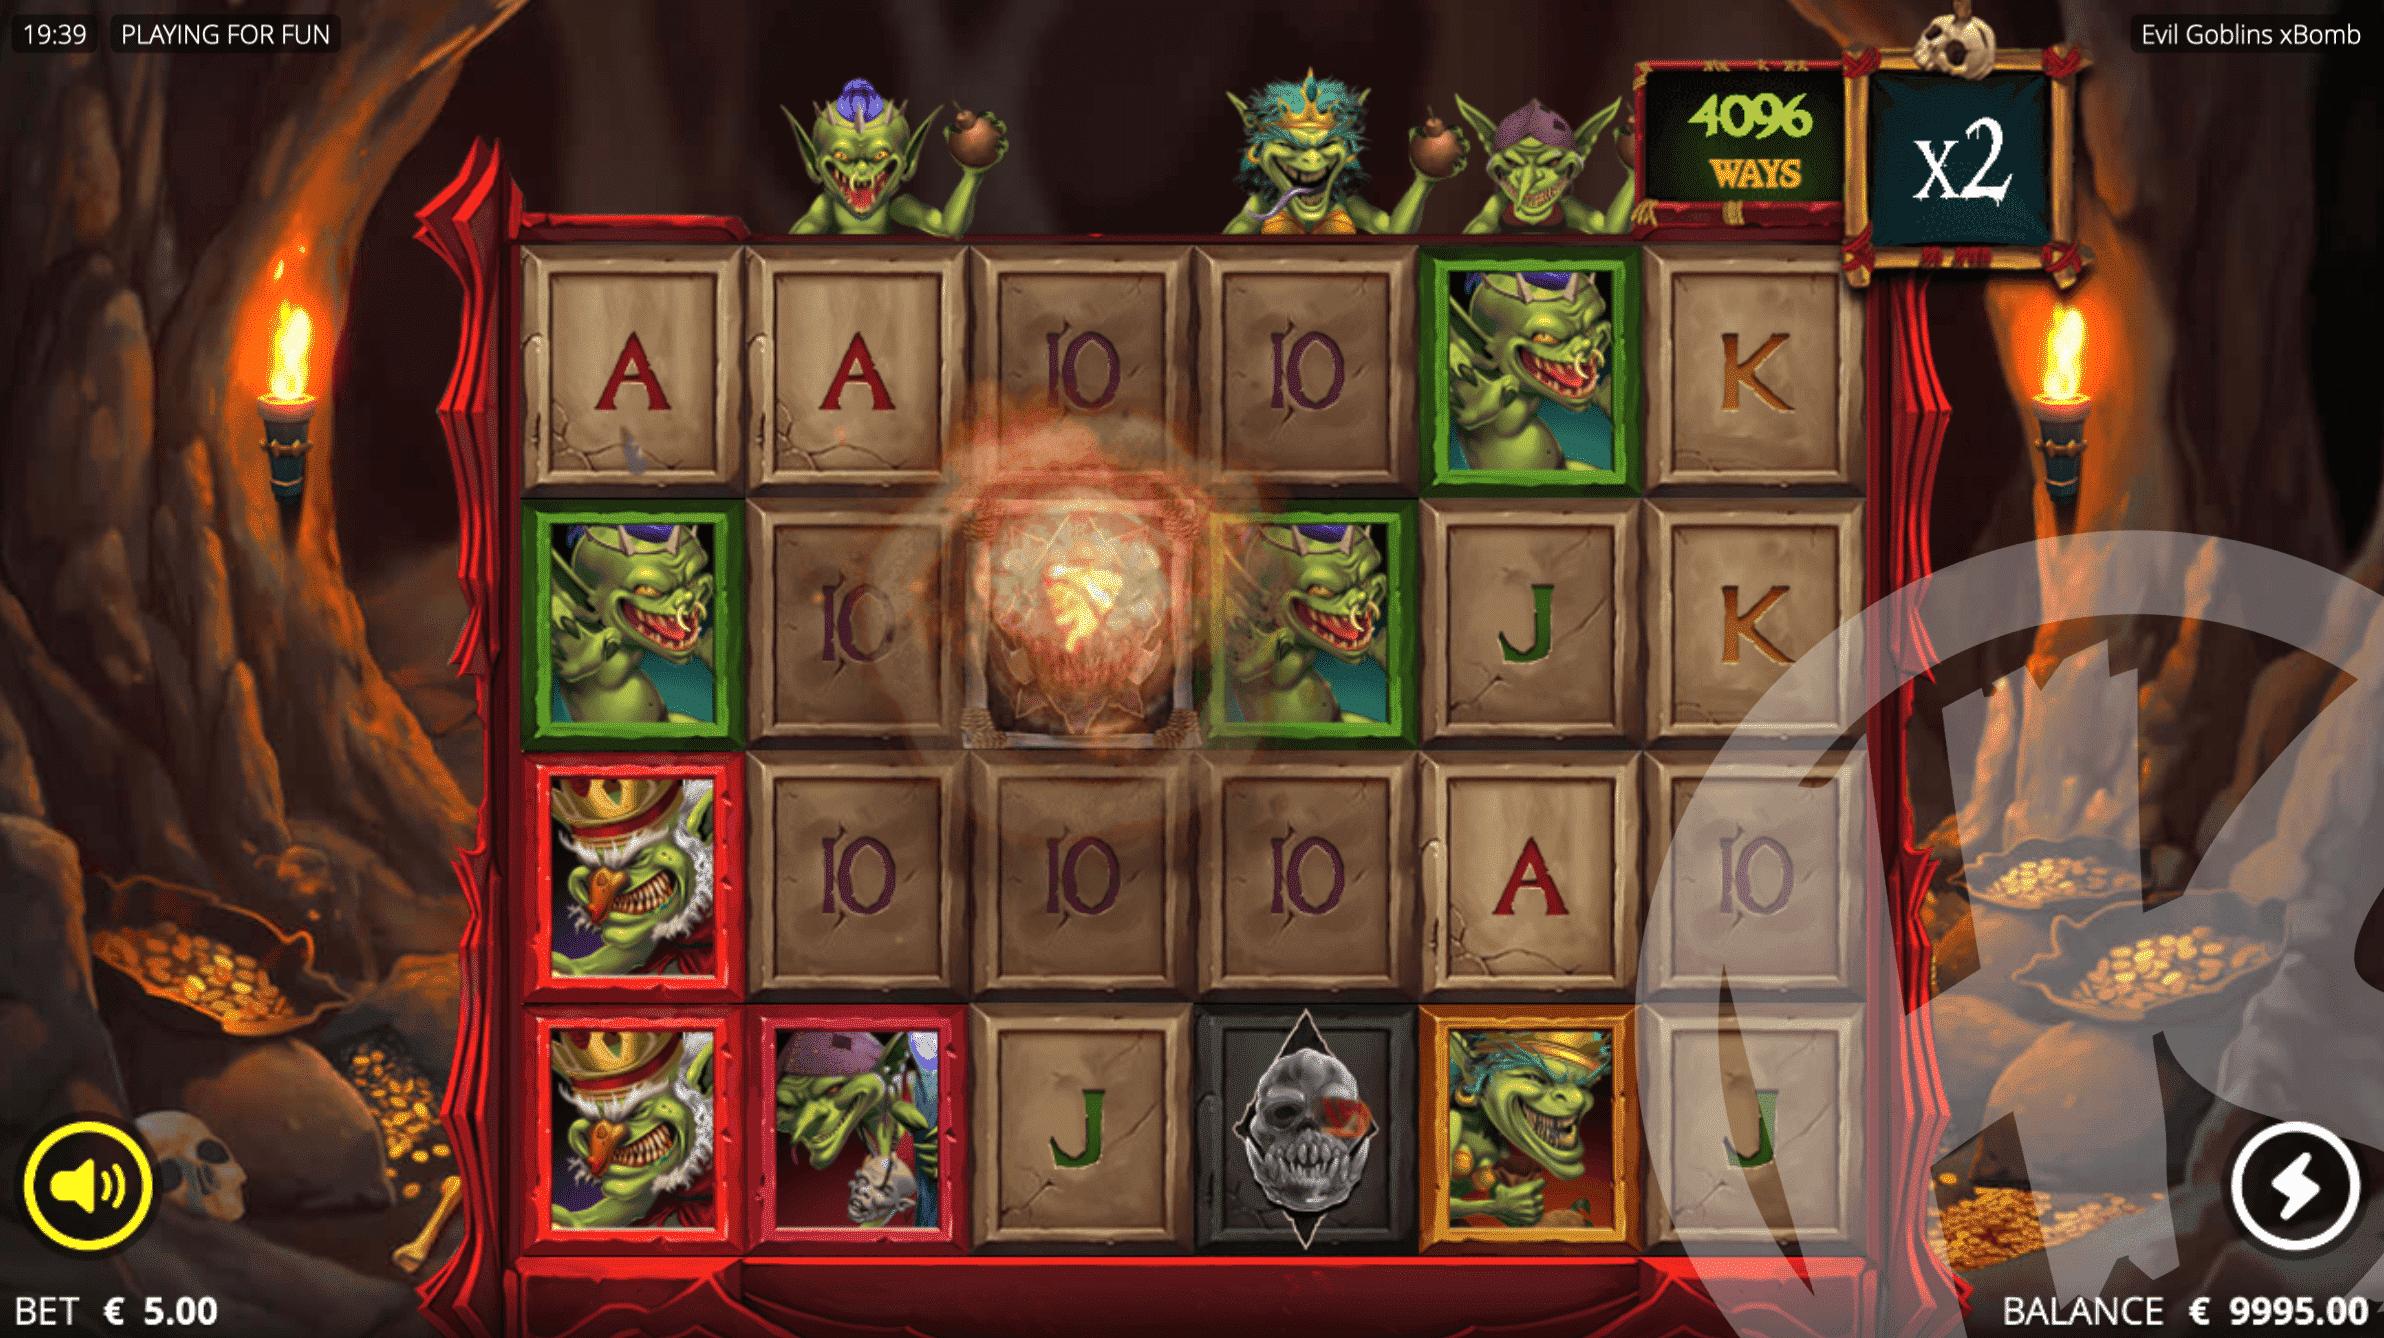 Goblin Sacrifice Helps Wilds to Land